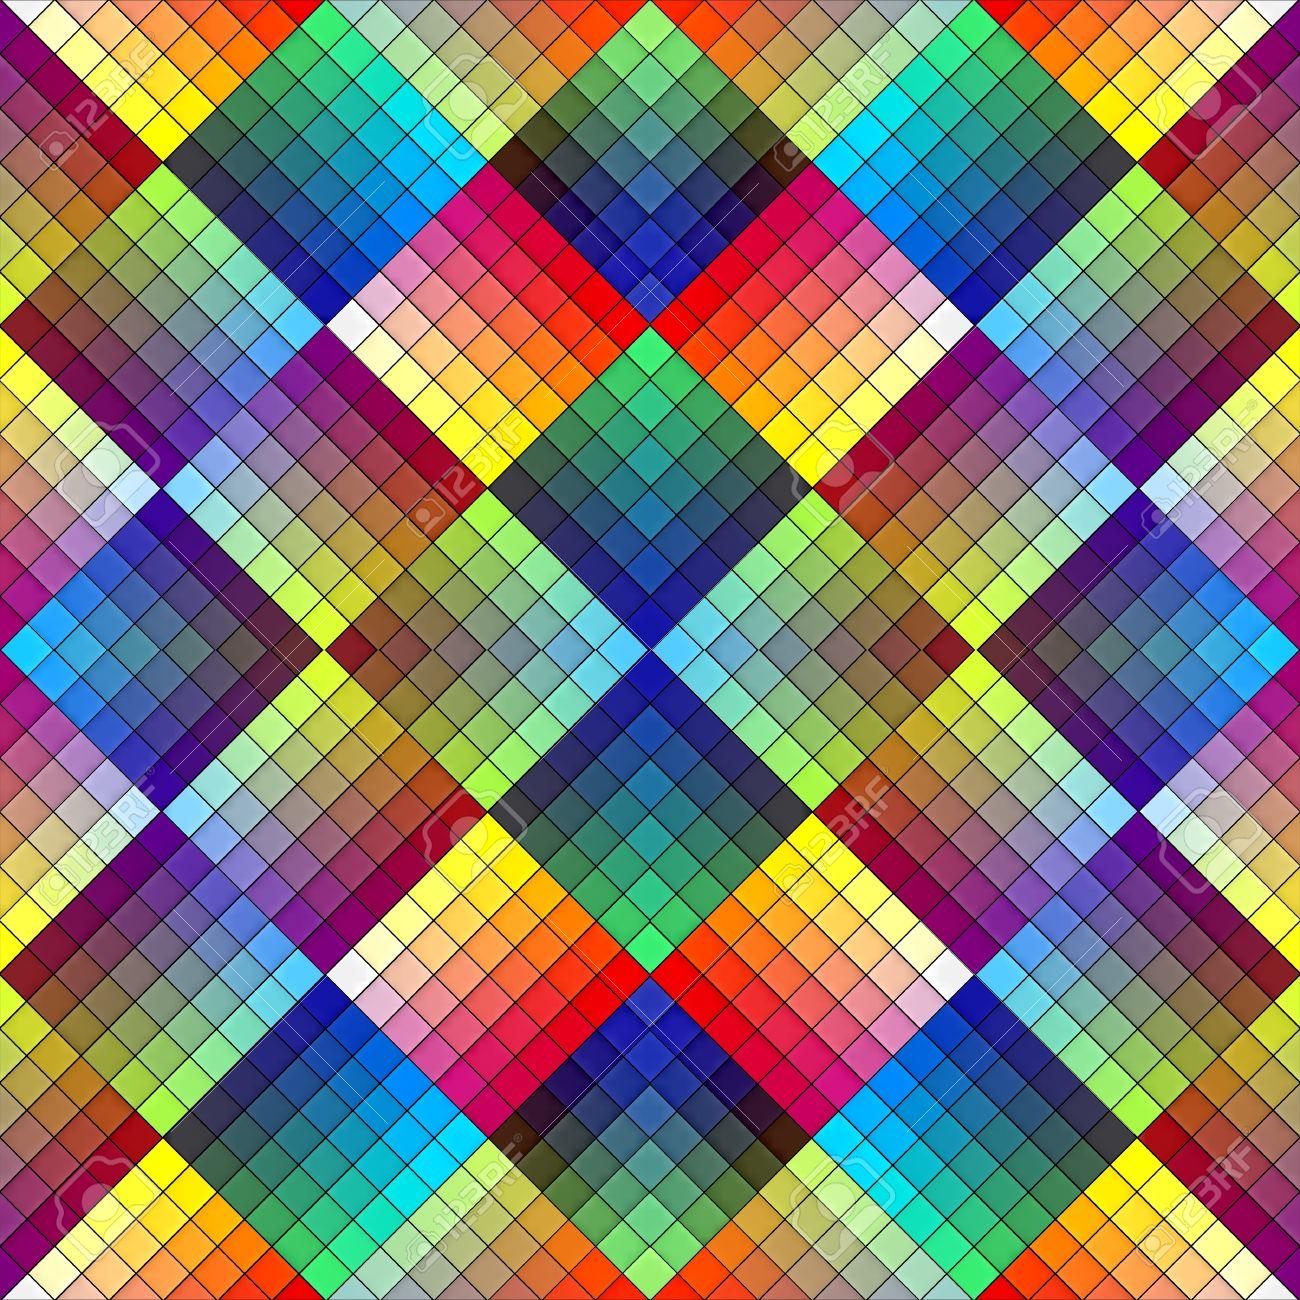 Art Deco Mosaic Tile In Retro Style Seamless Pattern In Vivid - Art deco mosaic tile patterns